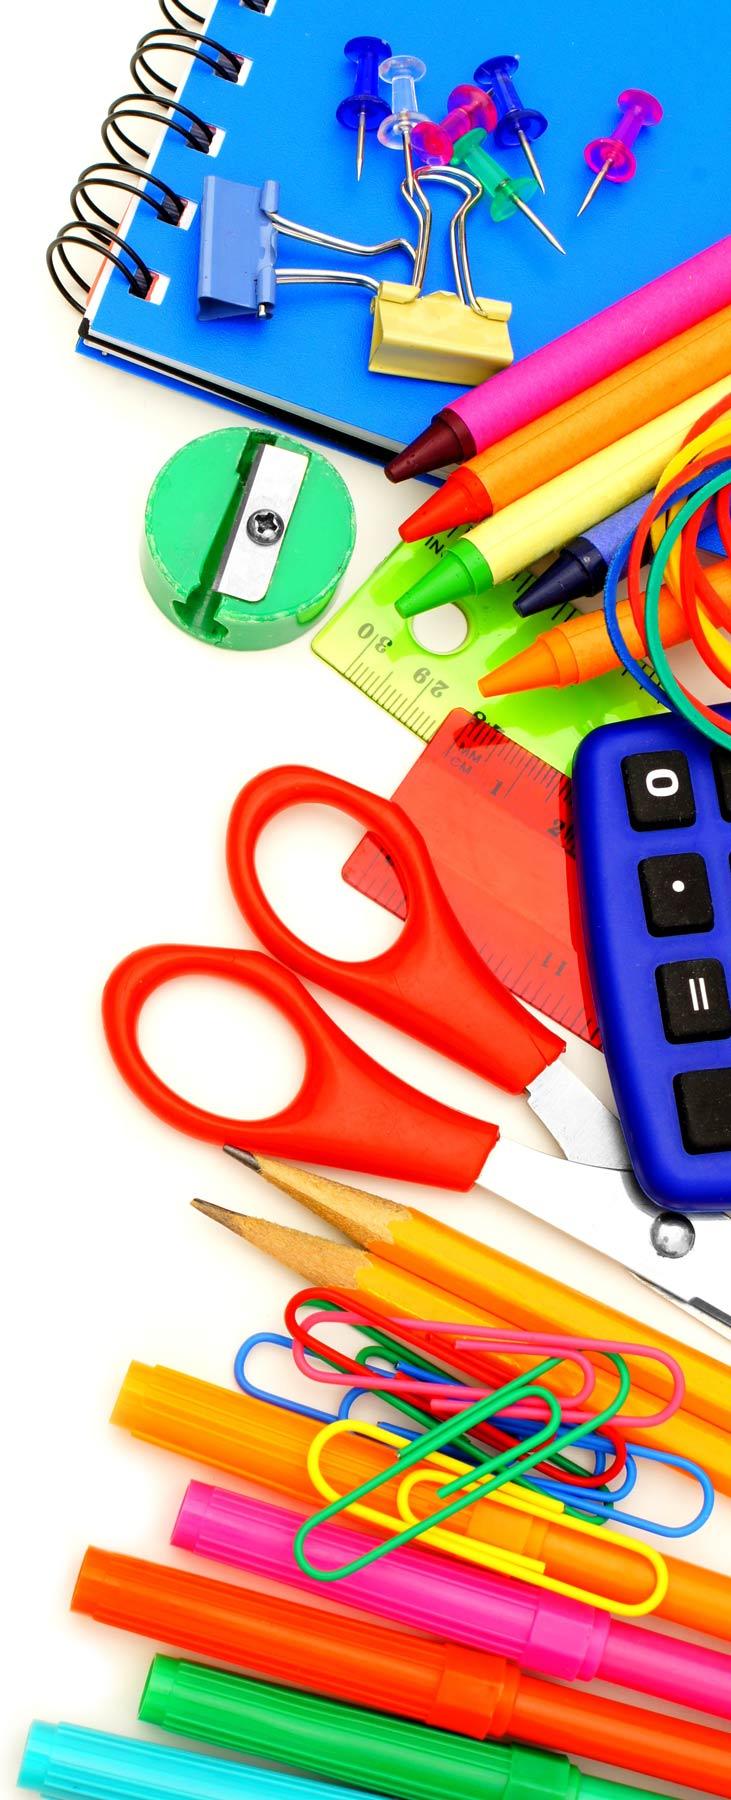 Newberg School District Elementary School Supply Kits<br><h4>A fundraiser to help kids in Rwanda</h4>